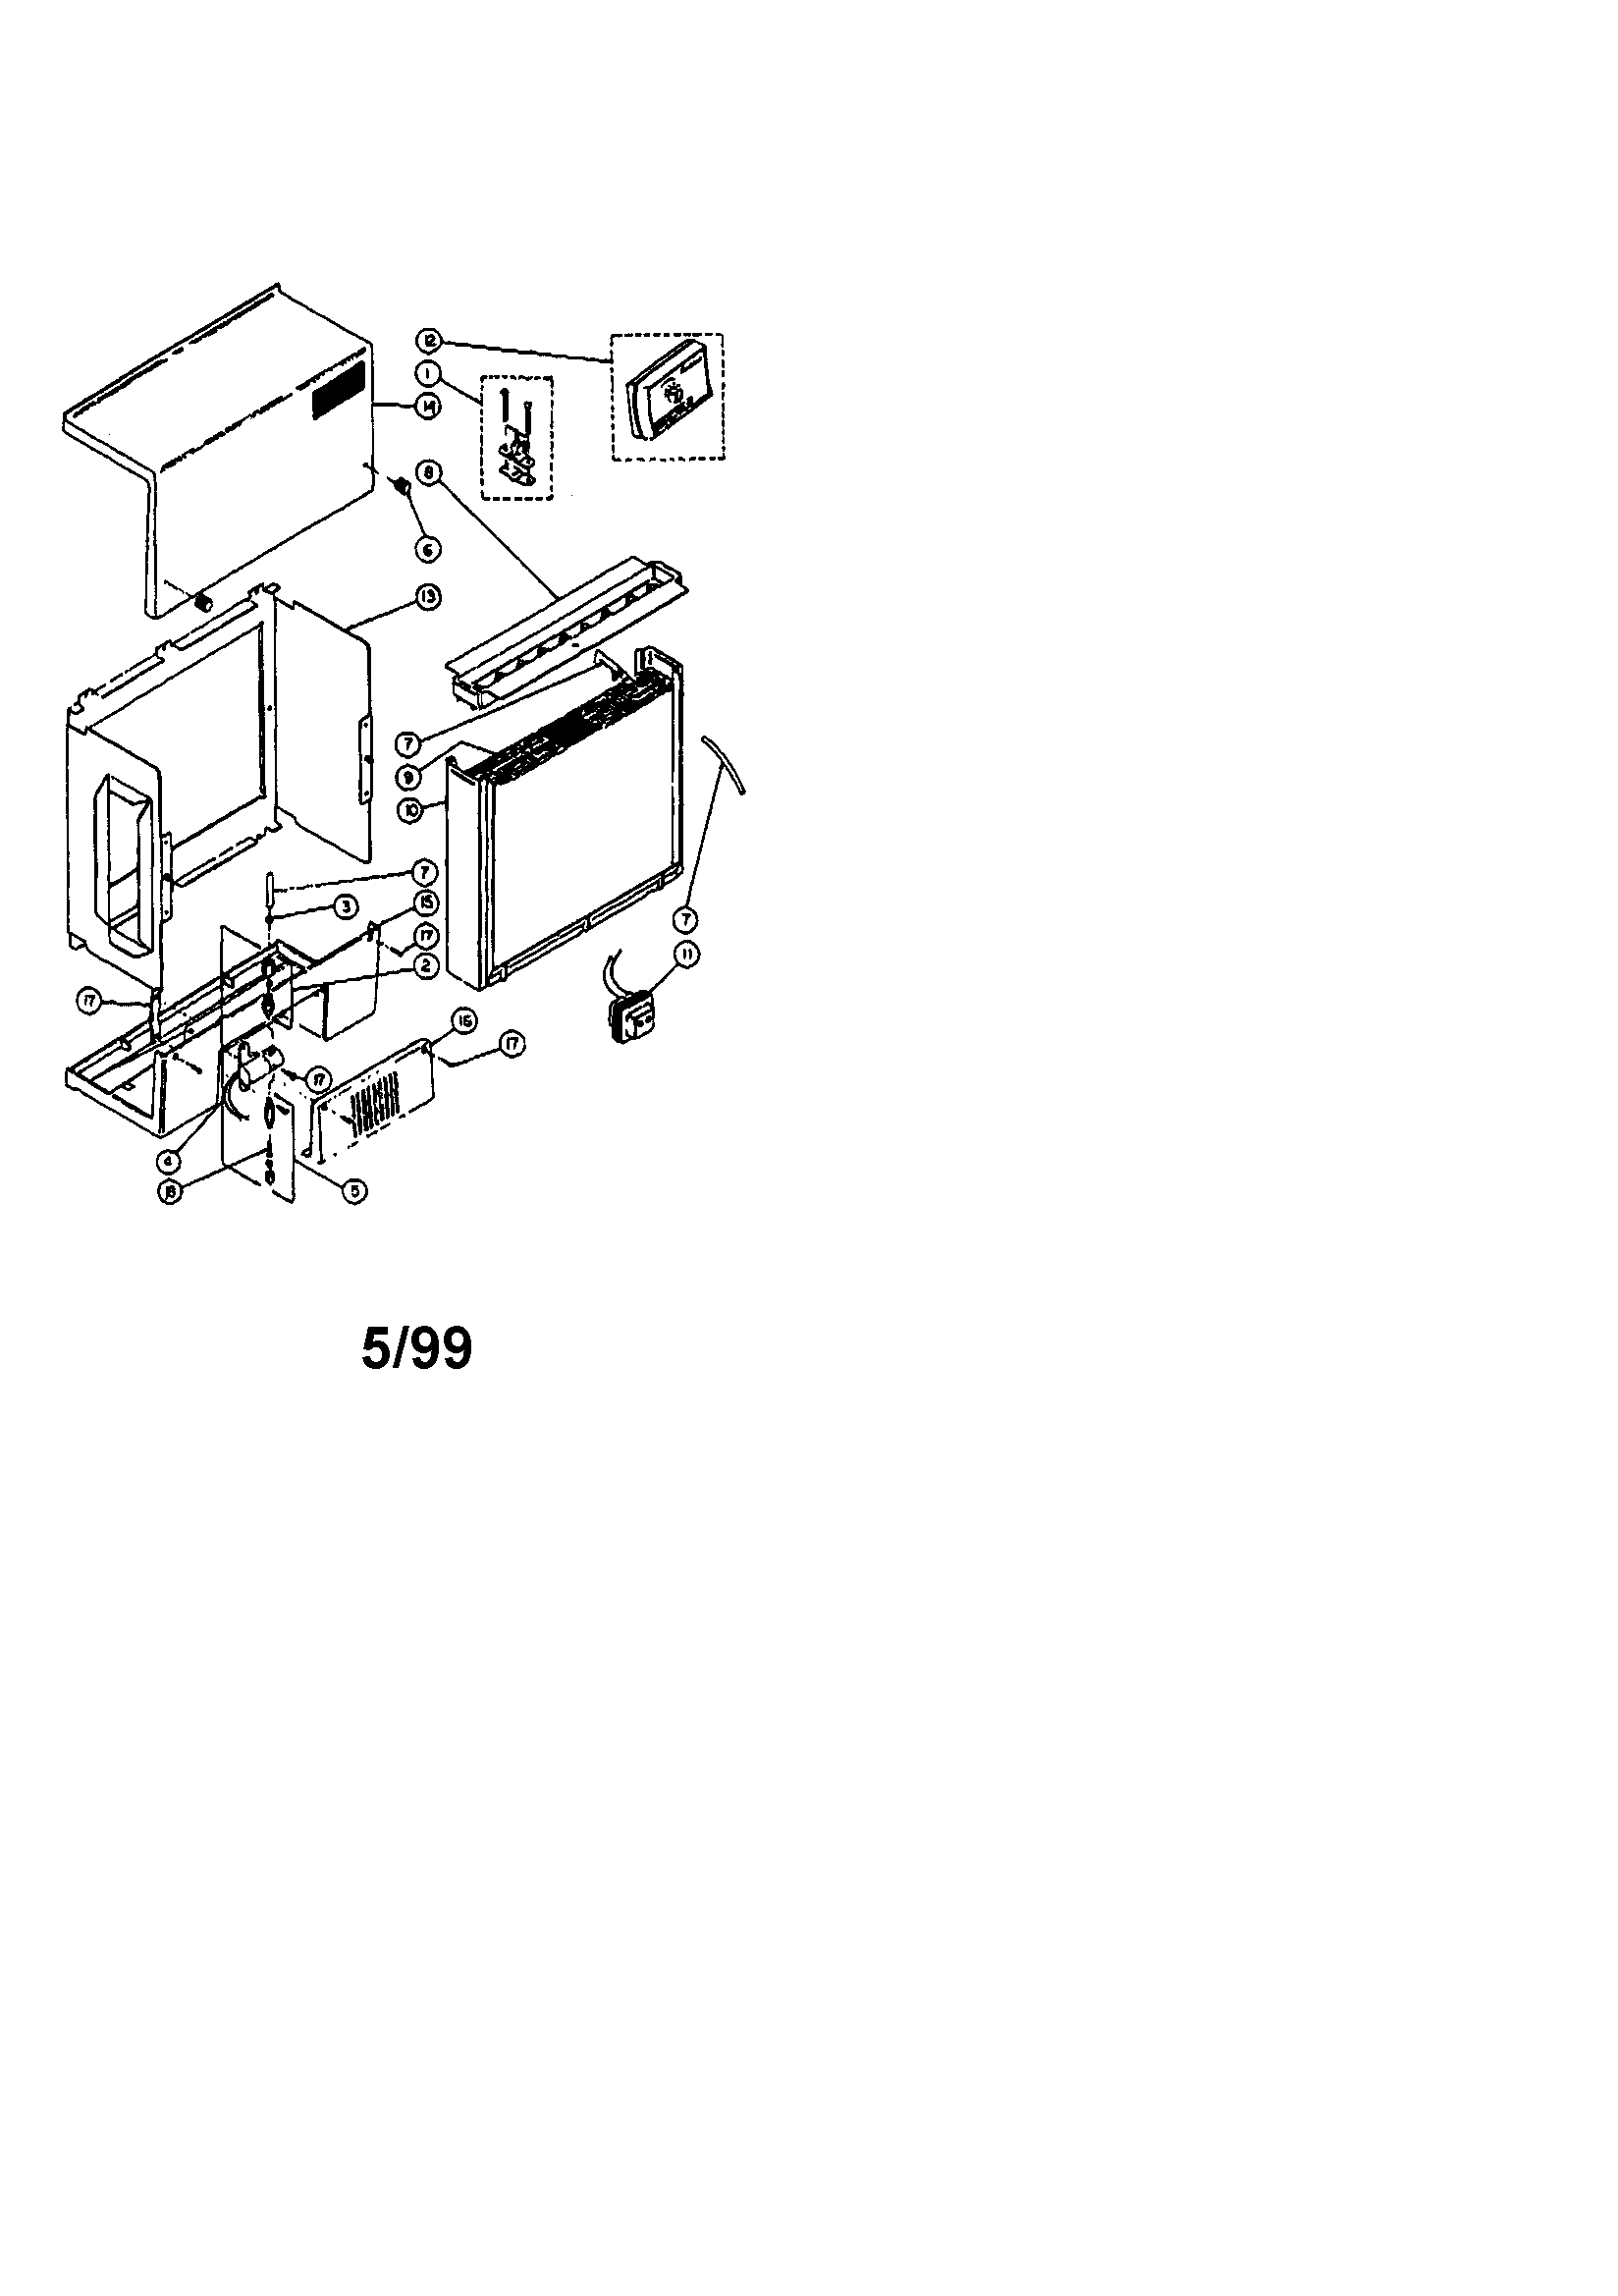 Aprilaire model 440 humidifier genuine parts